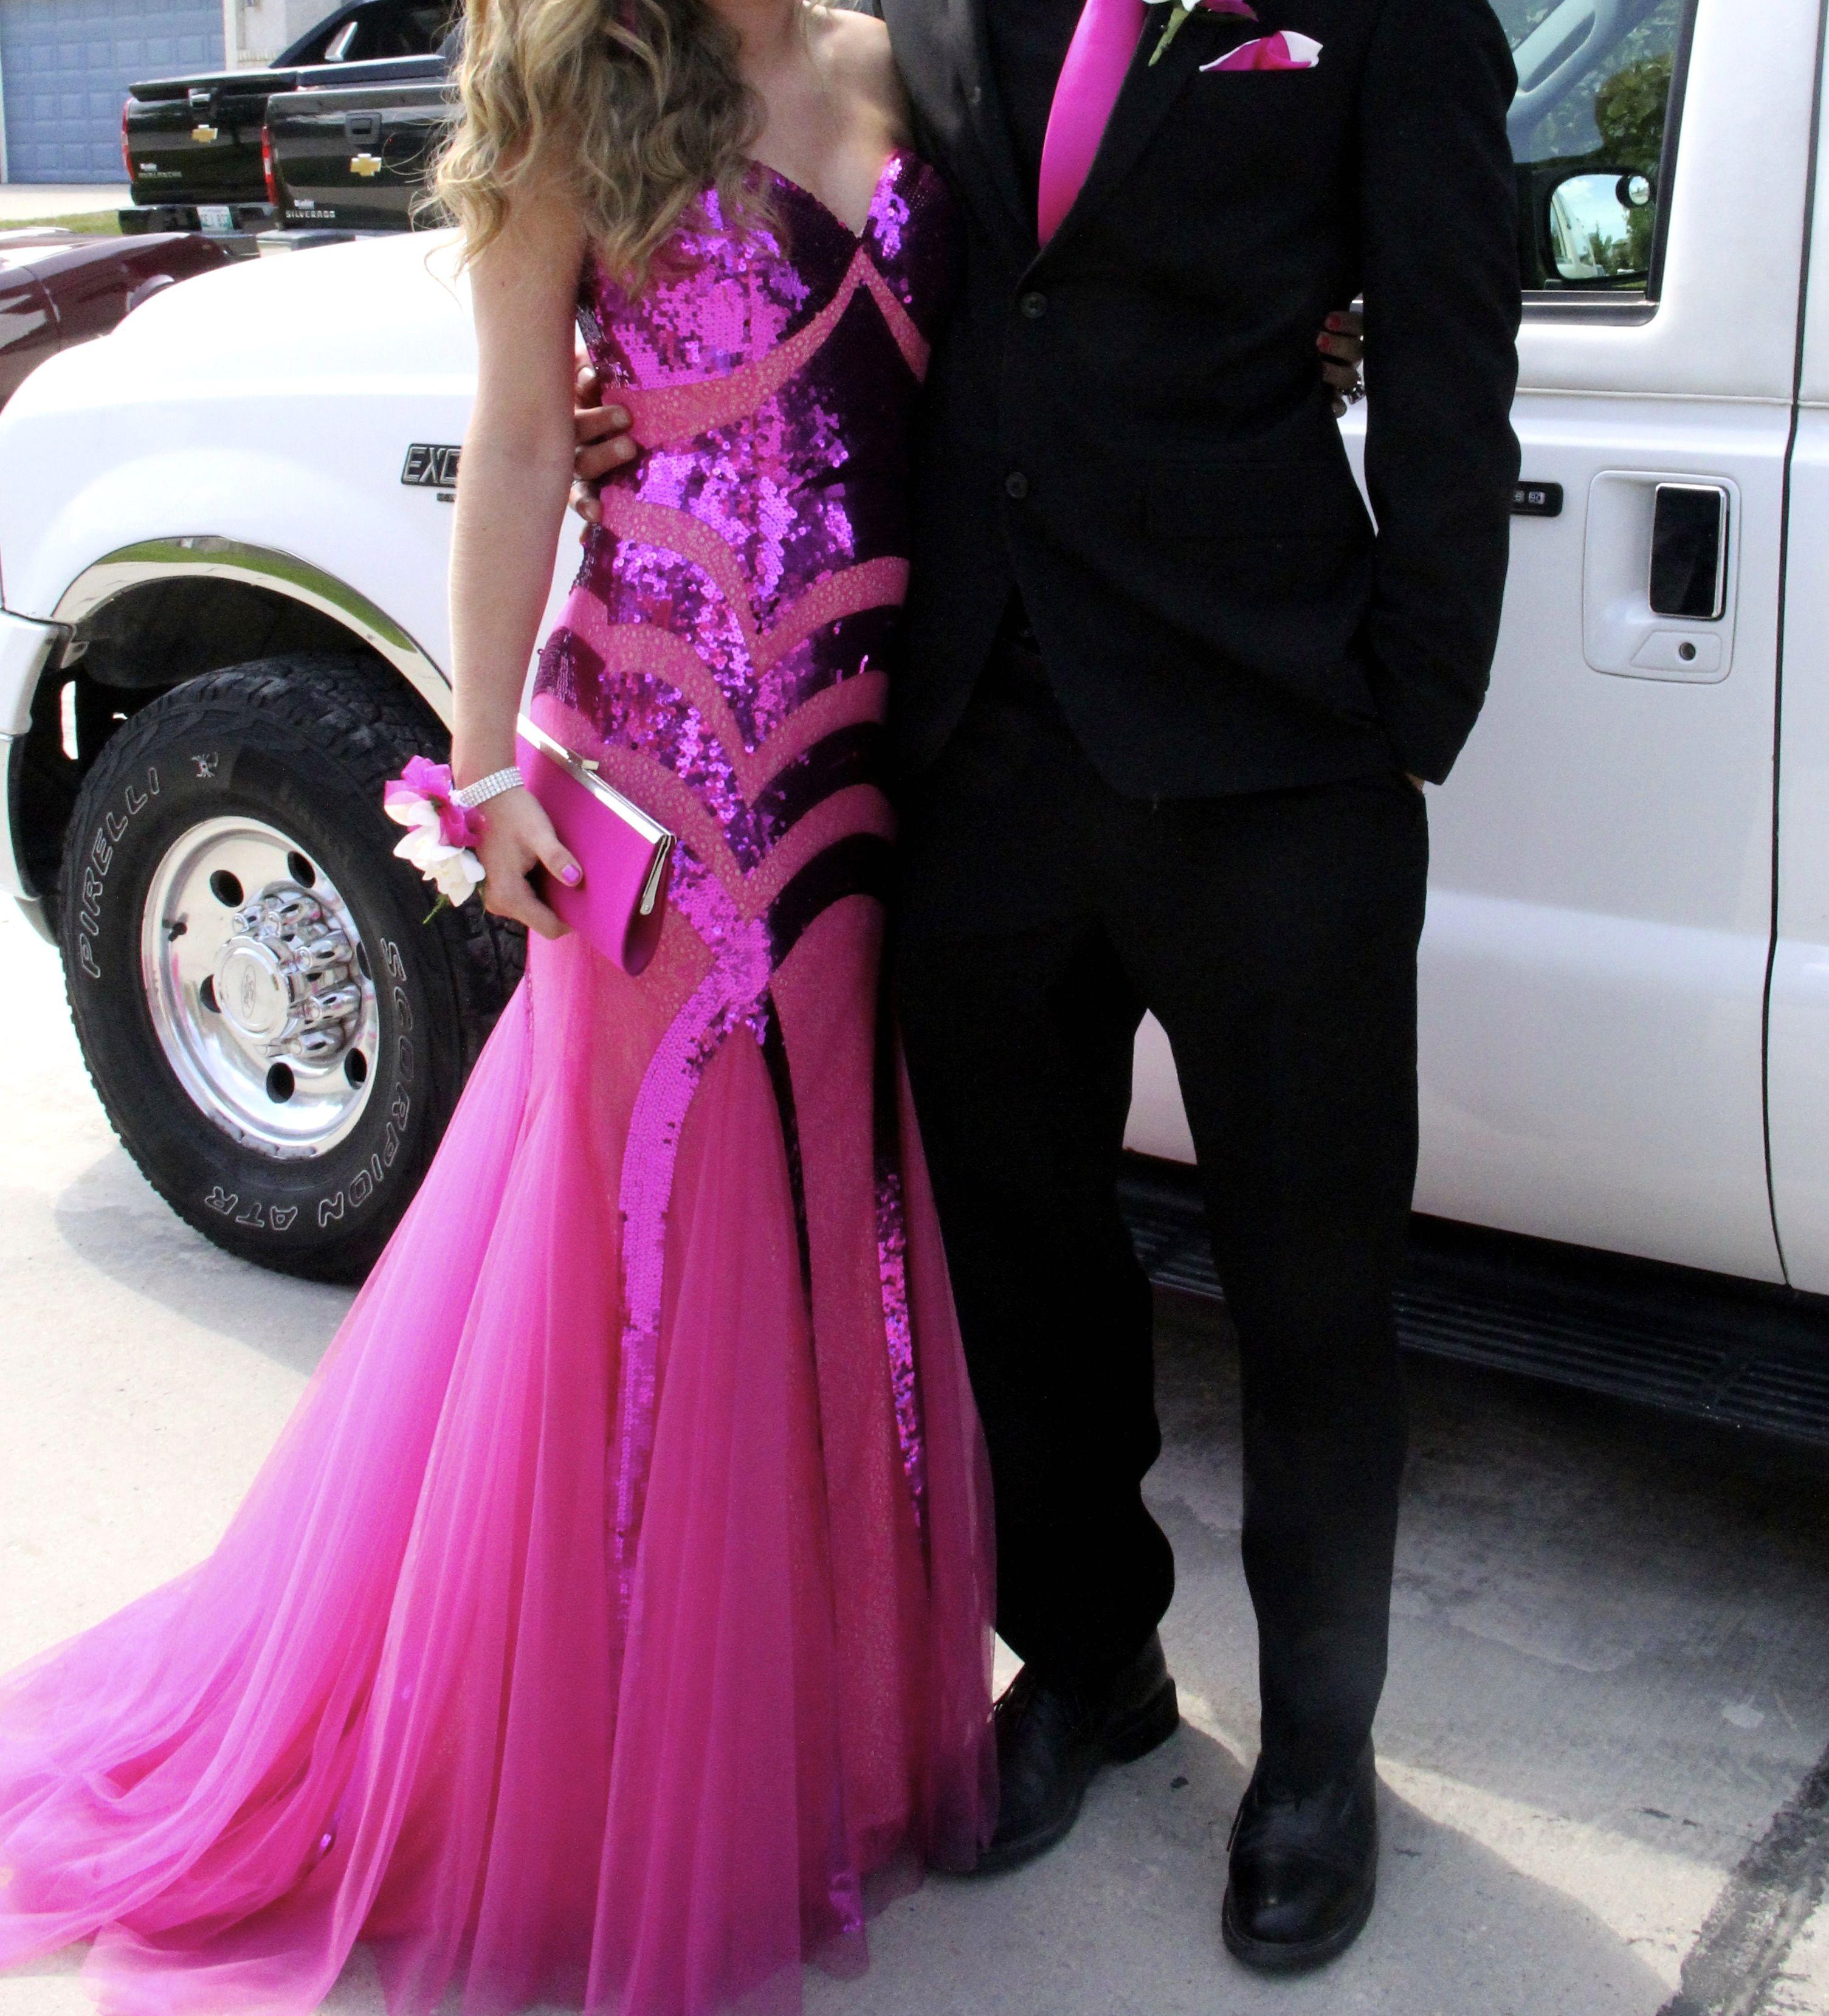 jovani grad dress | Costume - Hot Pink & Black | Pinterest